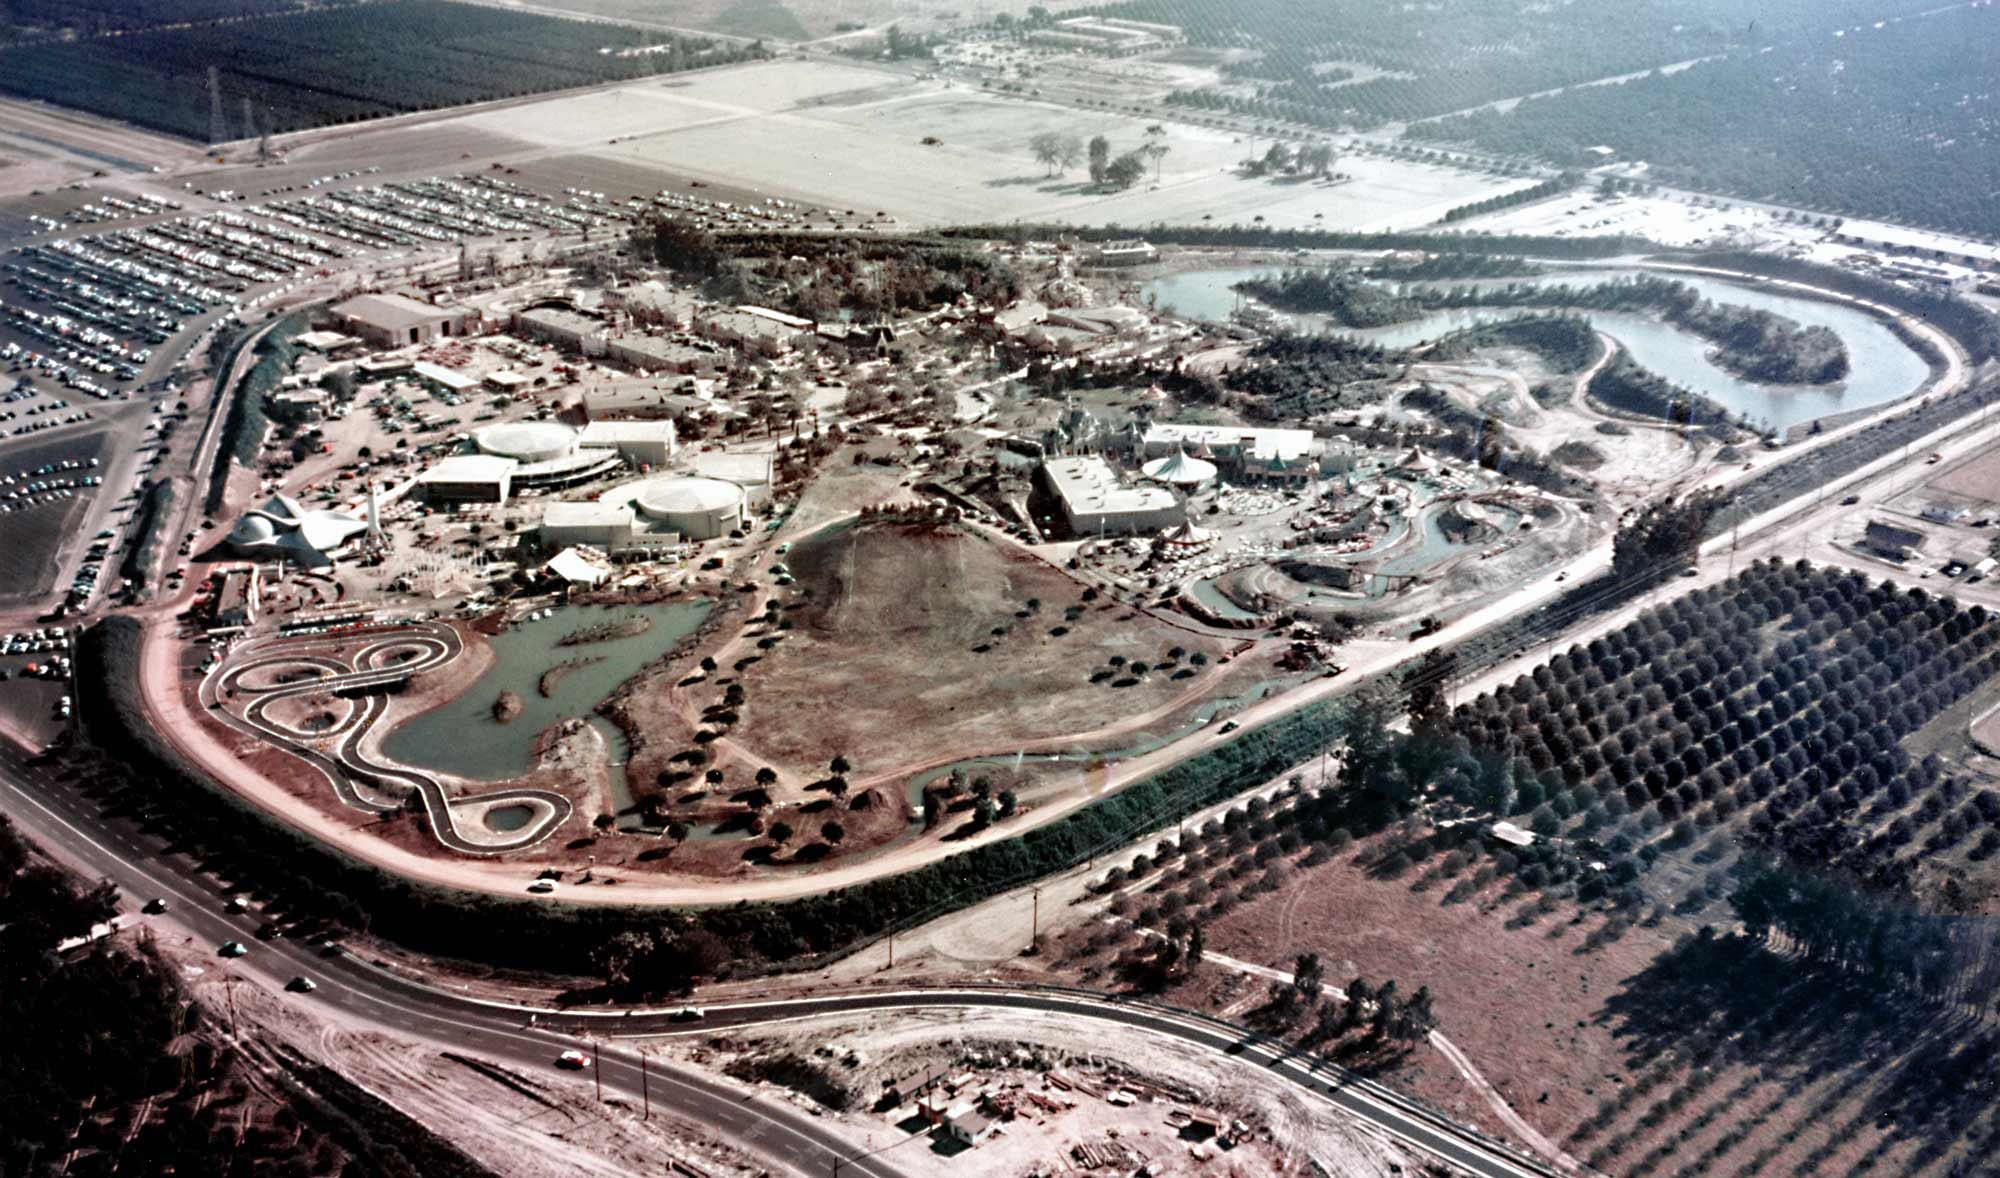 Aerial shot of Disneyland, facing south, taken in 1955.  (From WaltDisneyLand on Facebook)